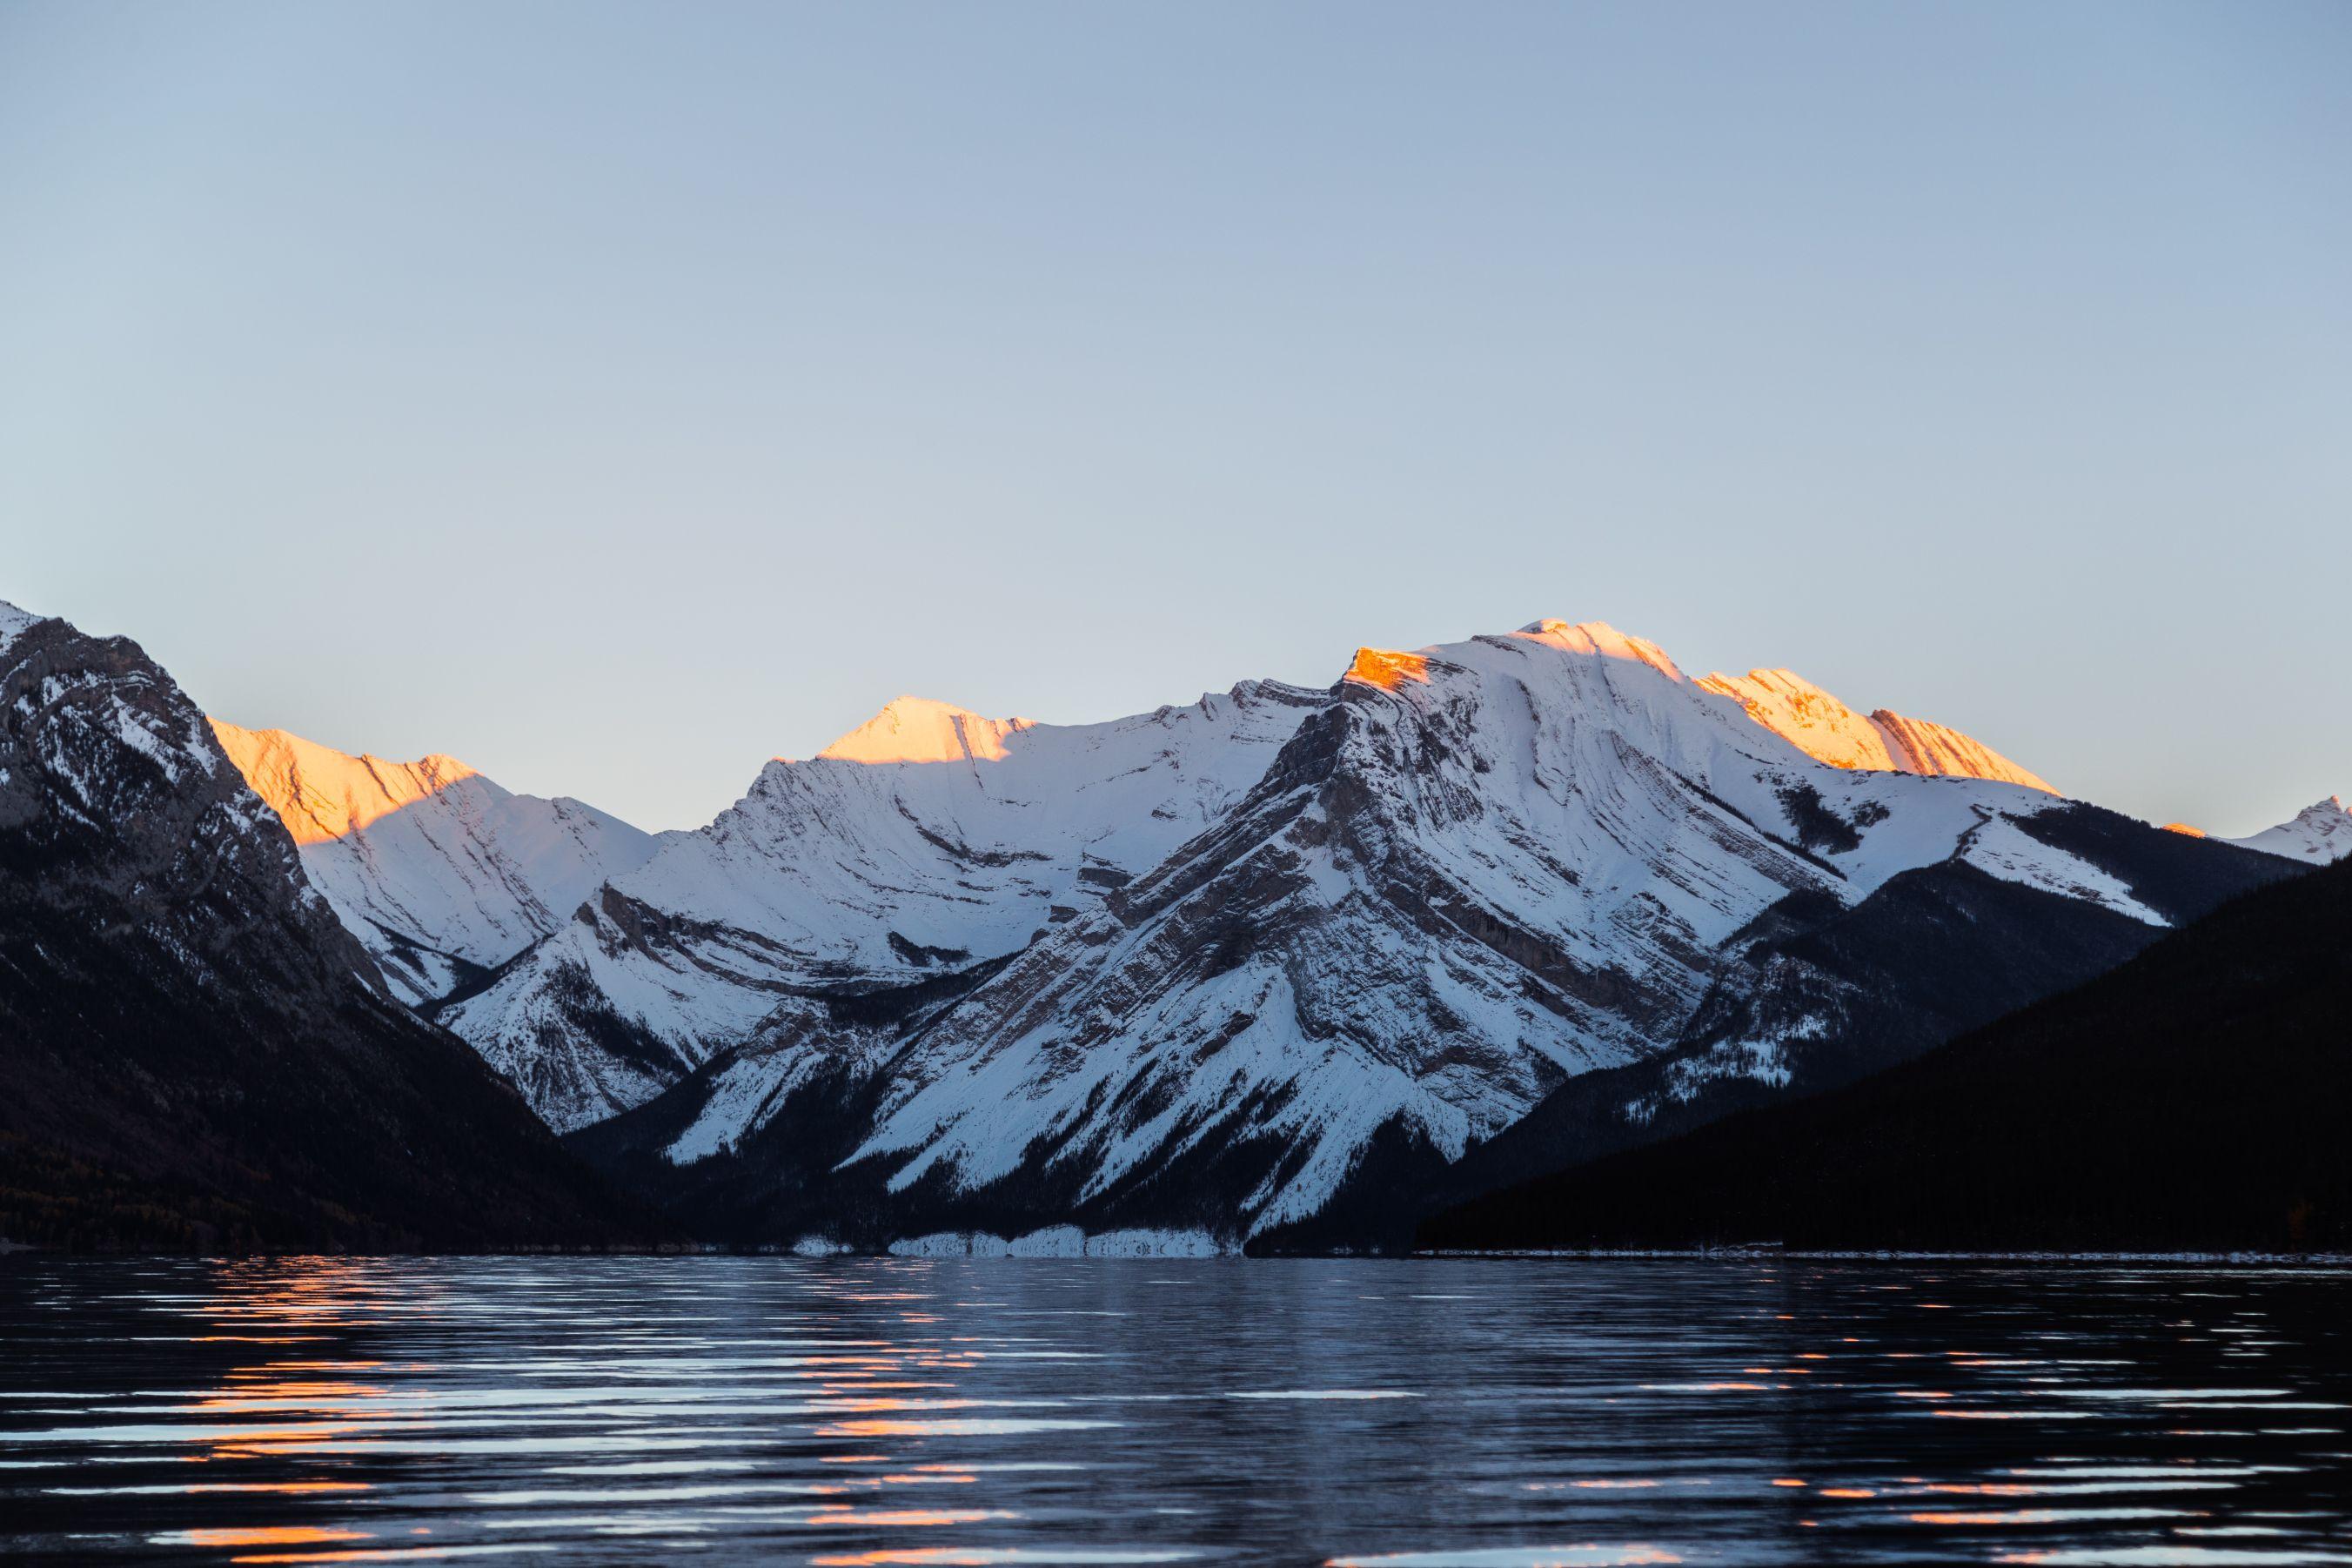 Last light hitting the peaks of snowy mountains.